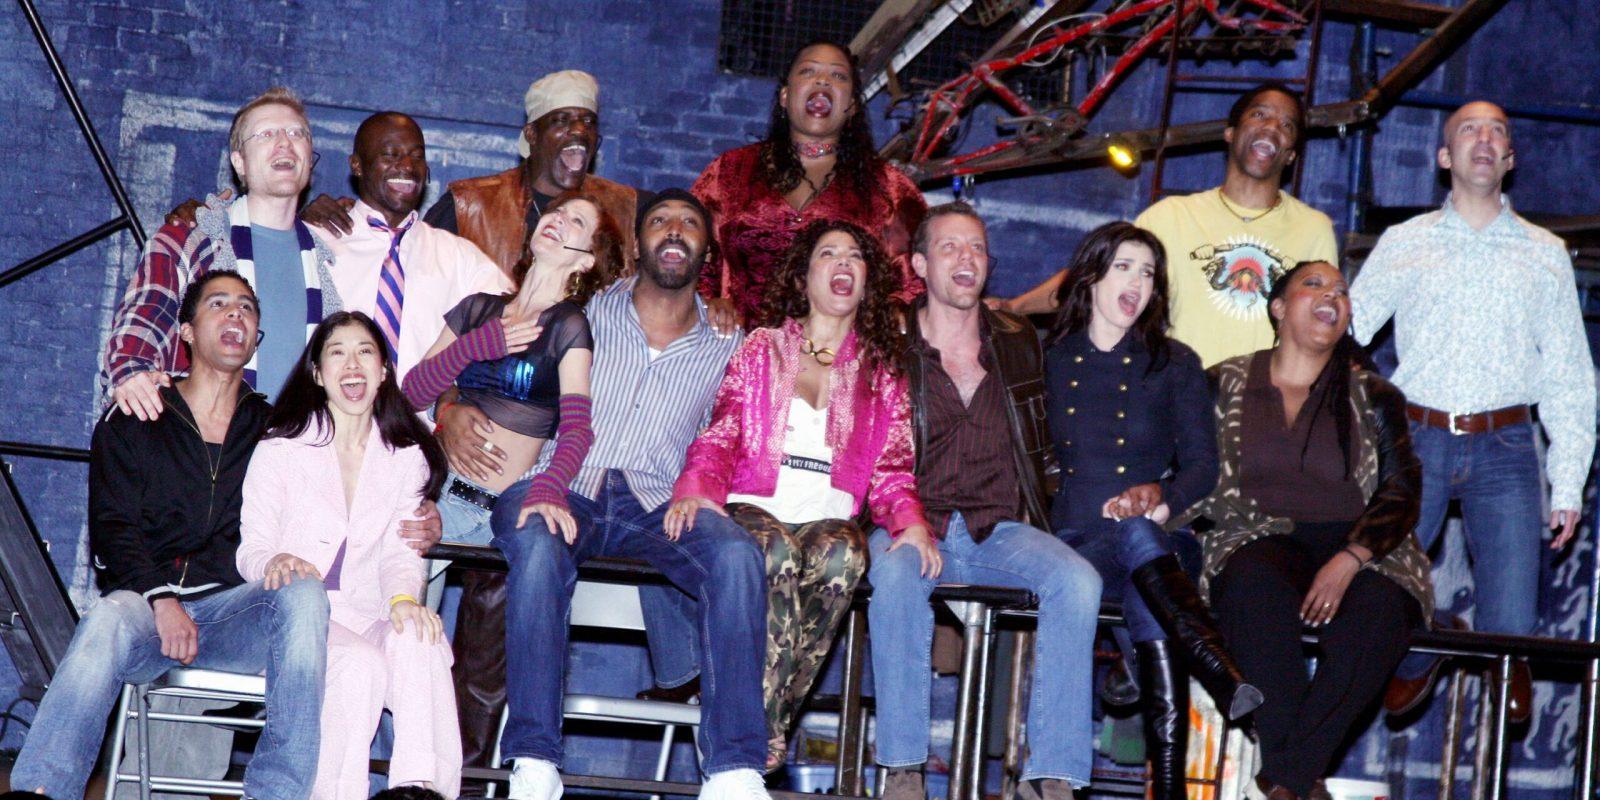 Rent's Original Broadway Cast Will Reunite During 'Rent Live' 1